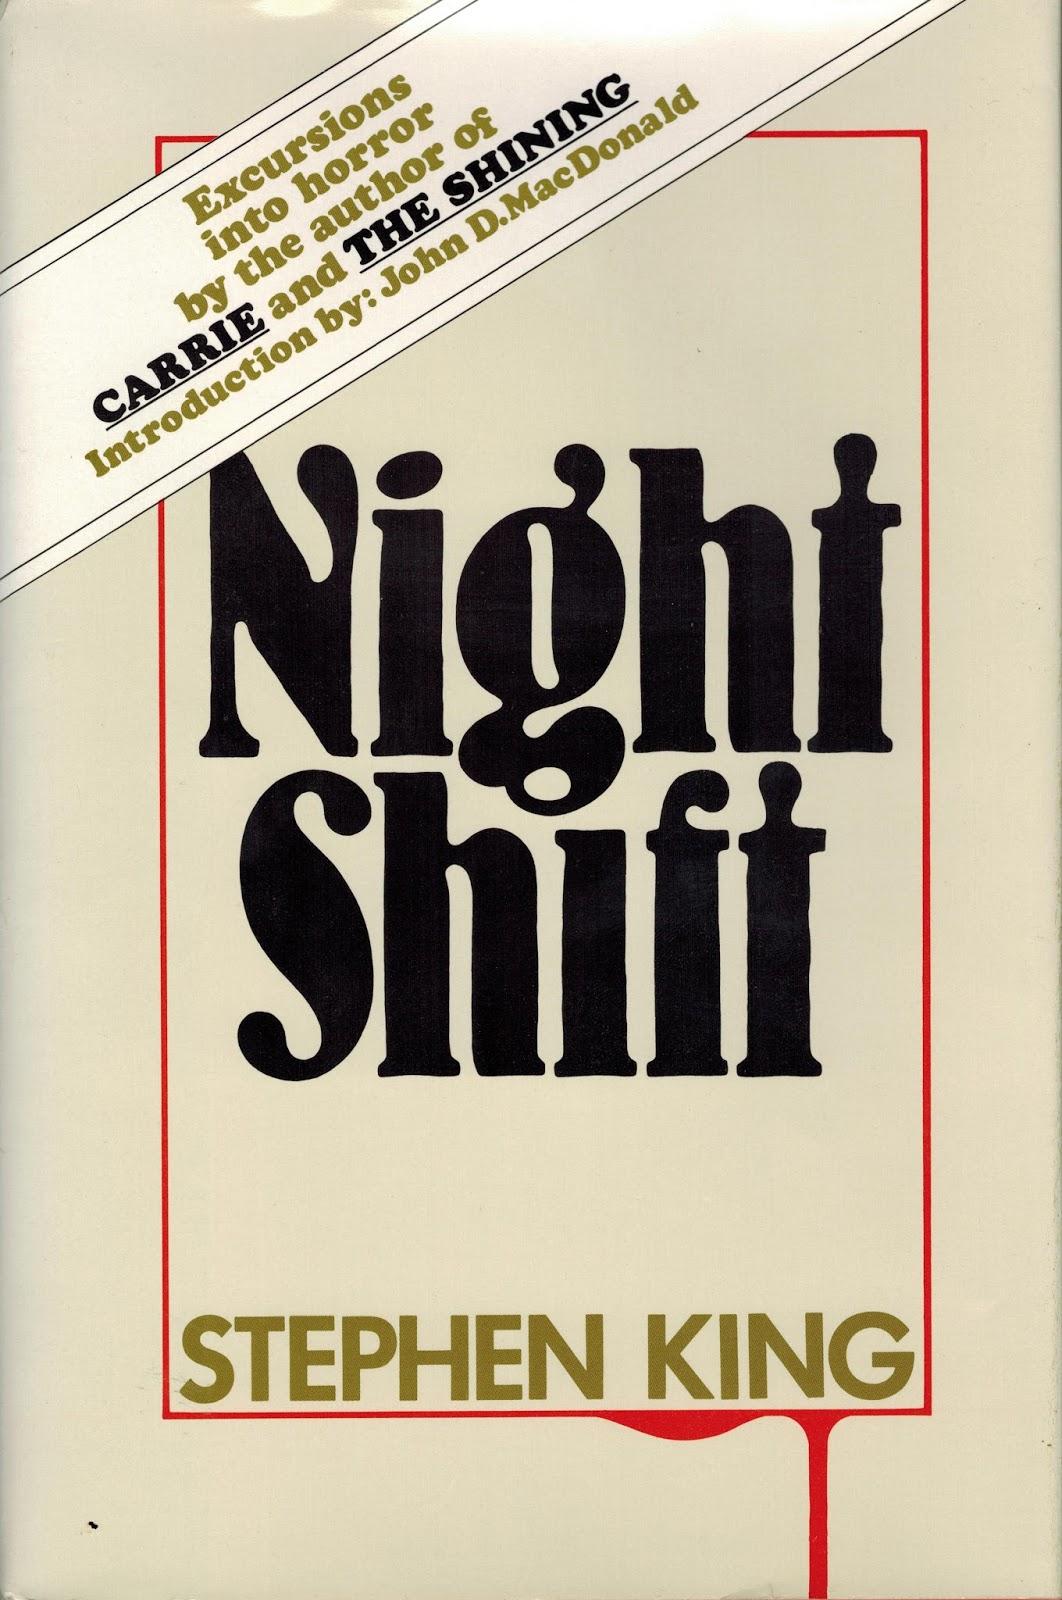 Night shifts in tone essay